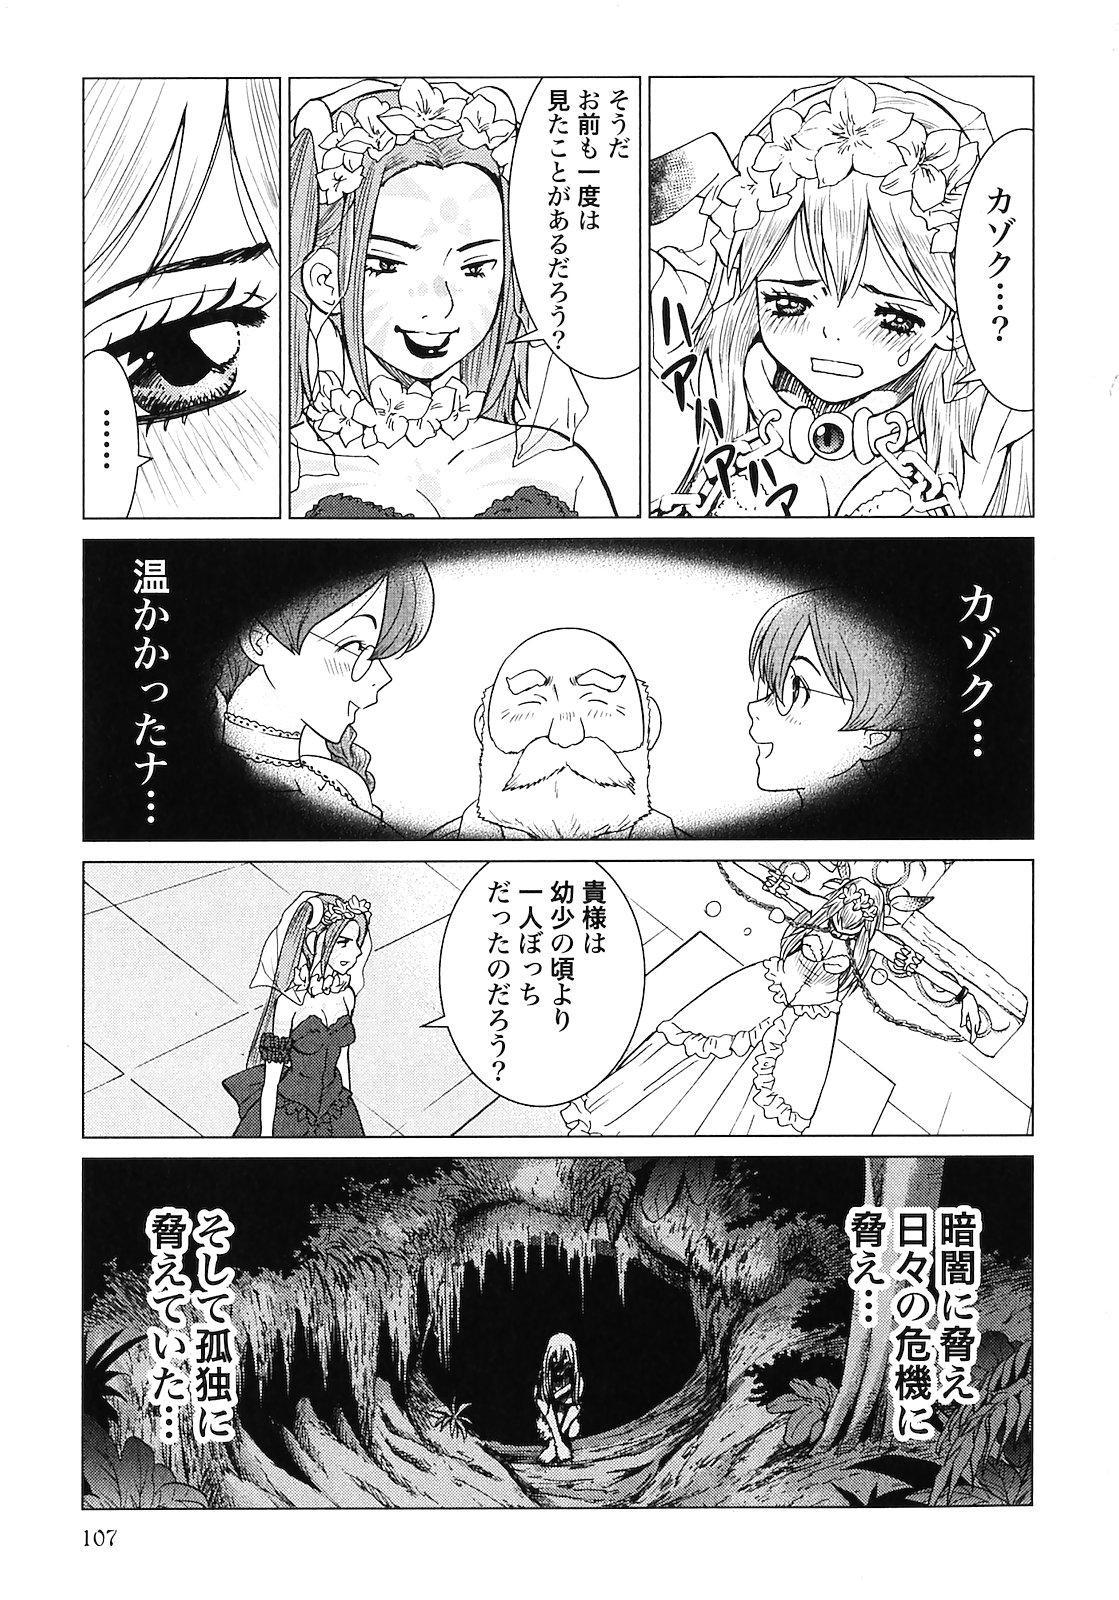 Makyo no Shanana Vol.02 108